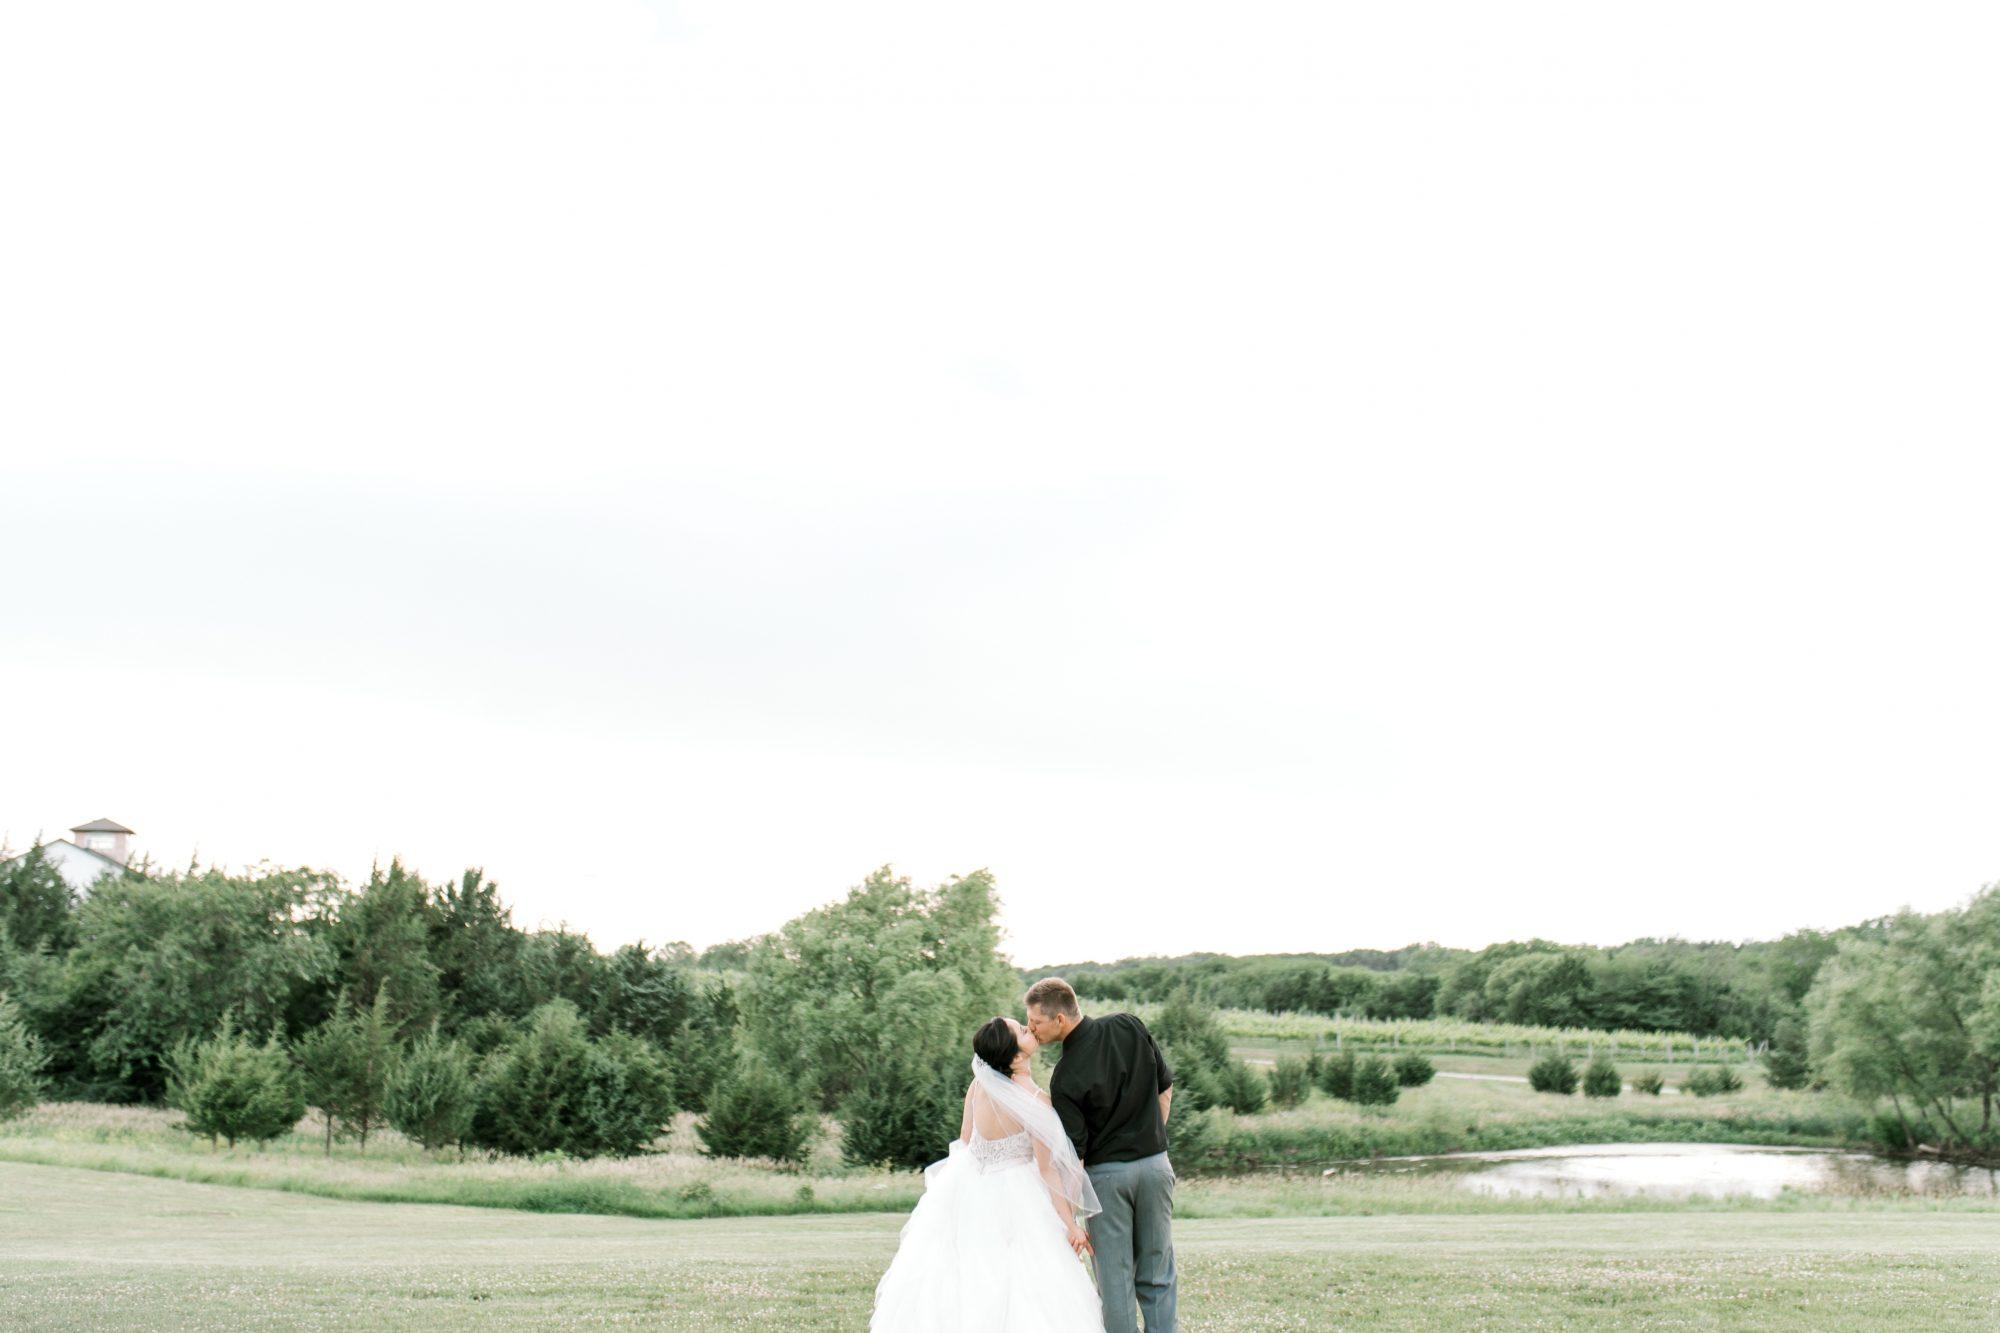 Glacial Till Wedding Pictures - Sam Areman Photo